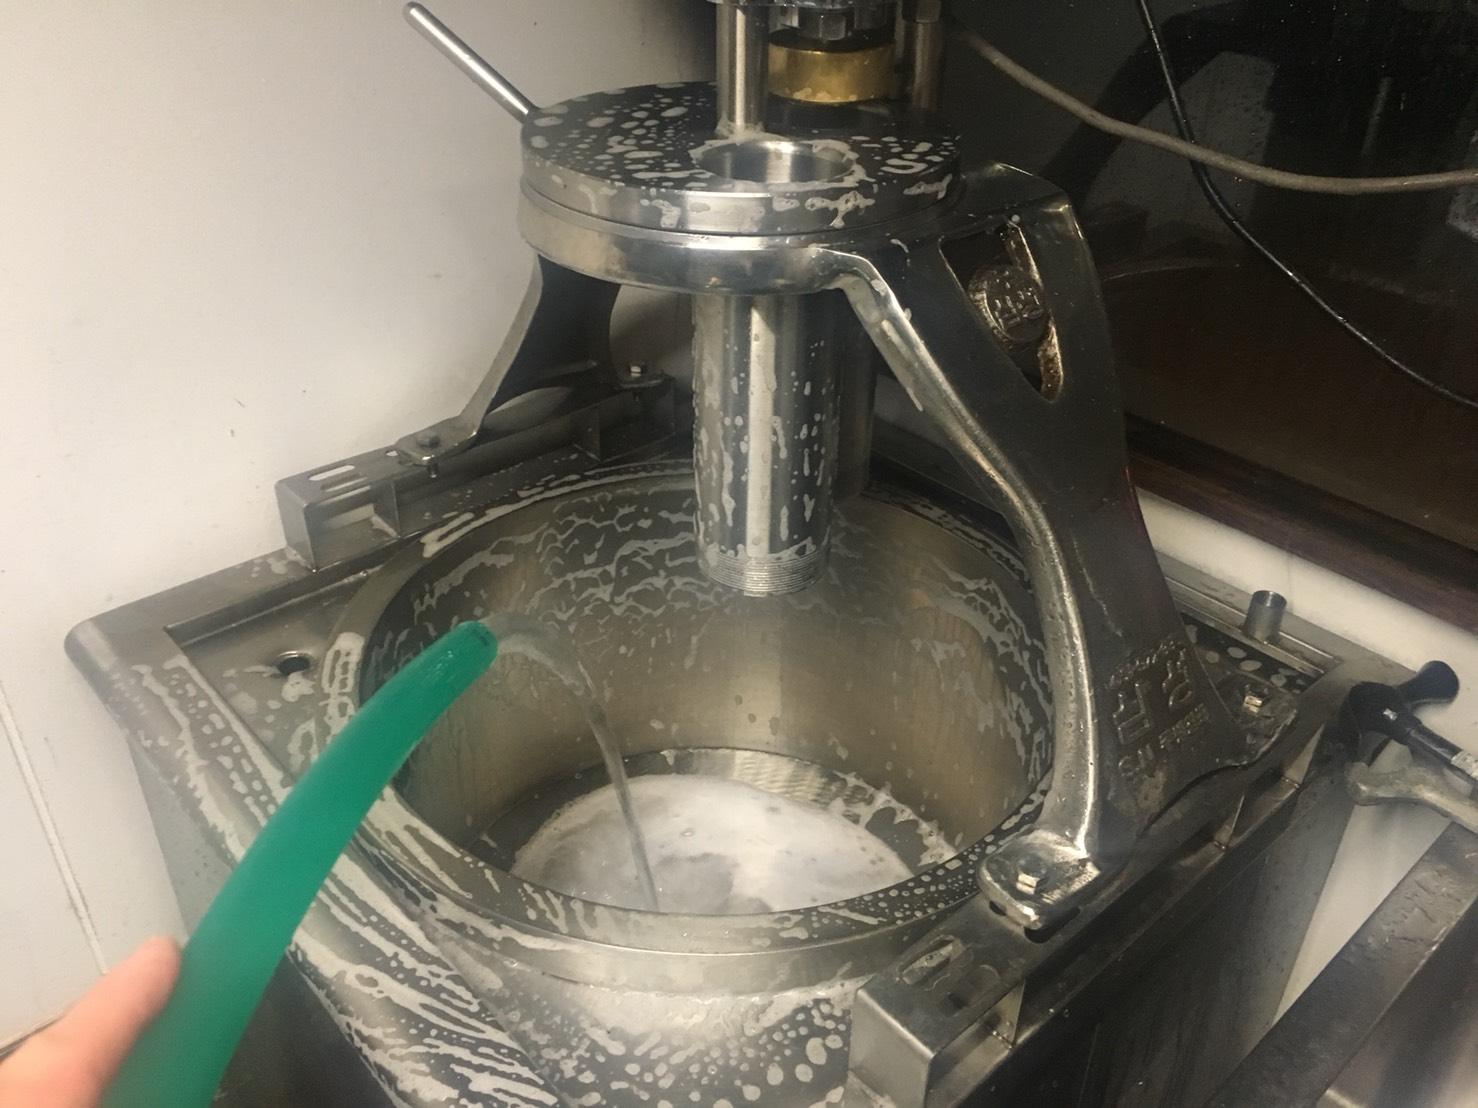 京都 アジョシ 韓国料理 冷麺 製麺機